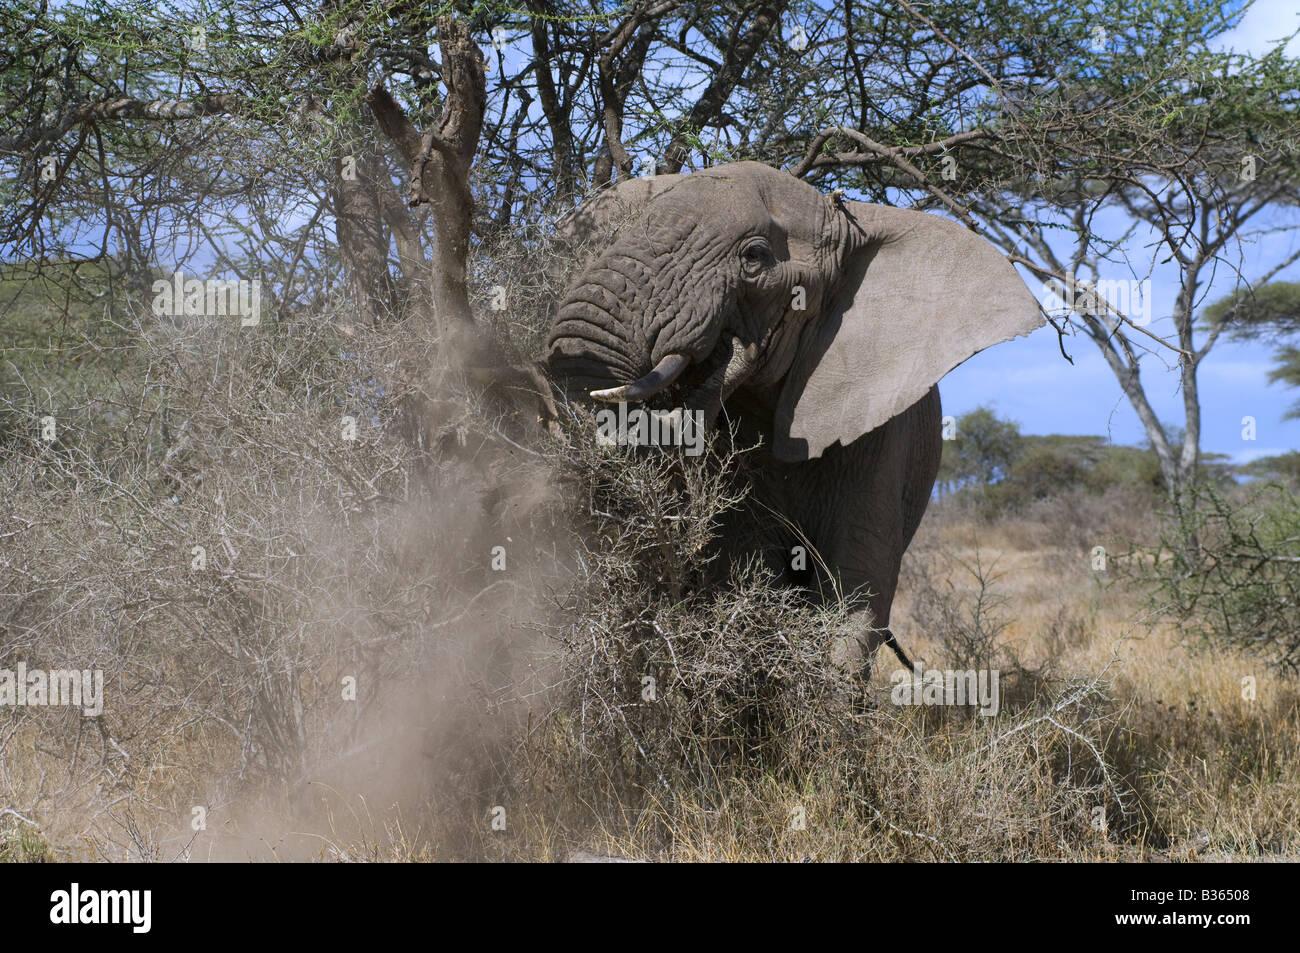 African elephant (Loxodonta africana) breaking a tree in a demonstration charge, Ndutu, Ngorongoro, Tanzania - Stock Image